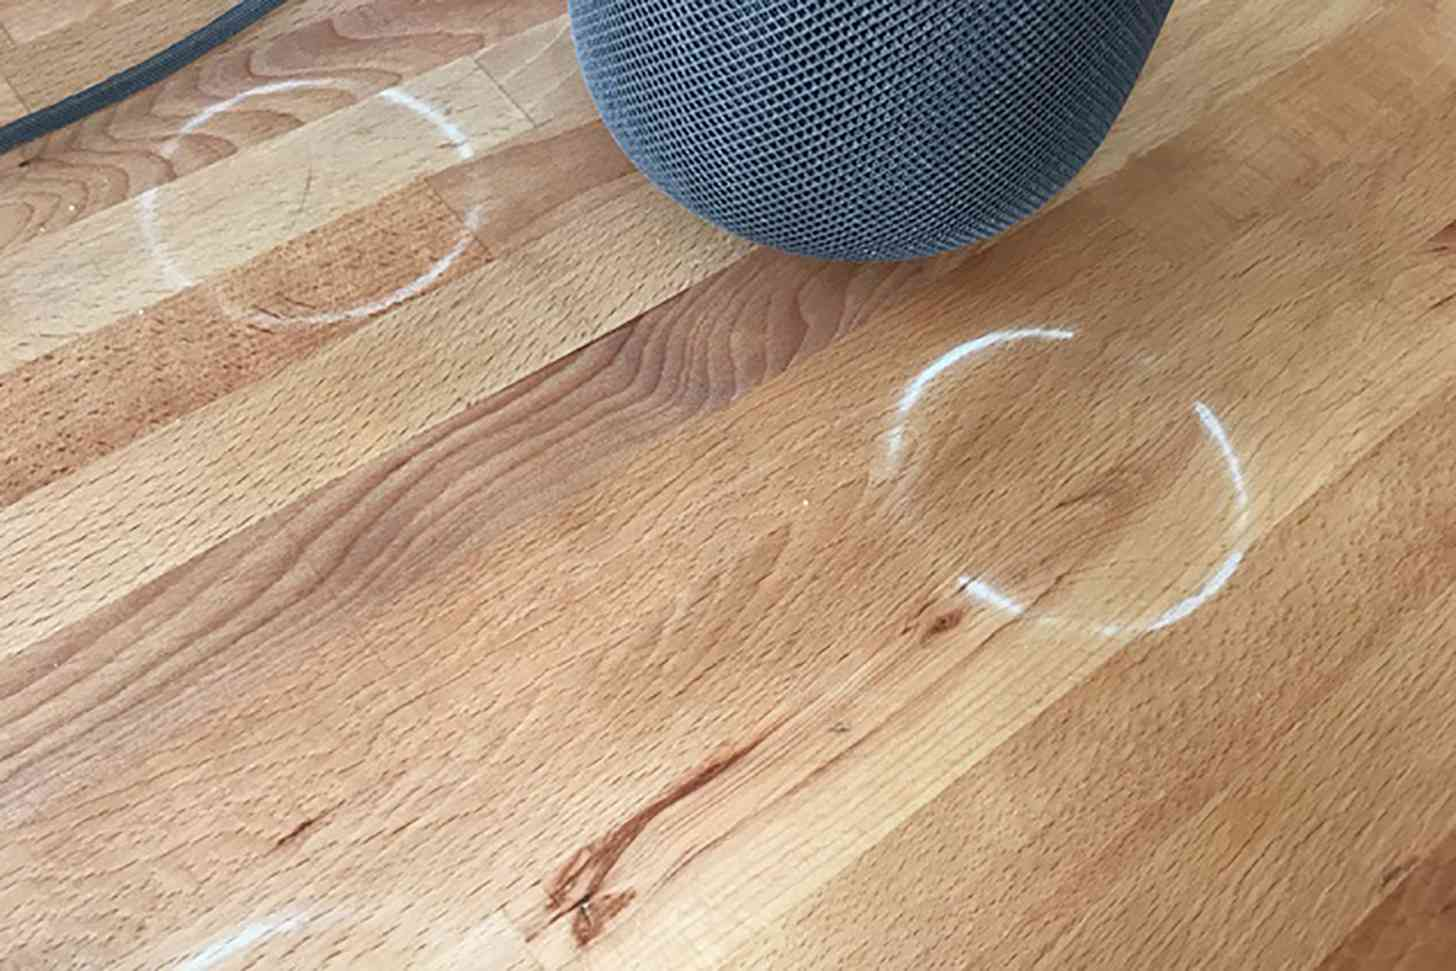 Apple HomePod white rings wood furniture